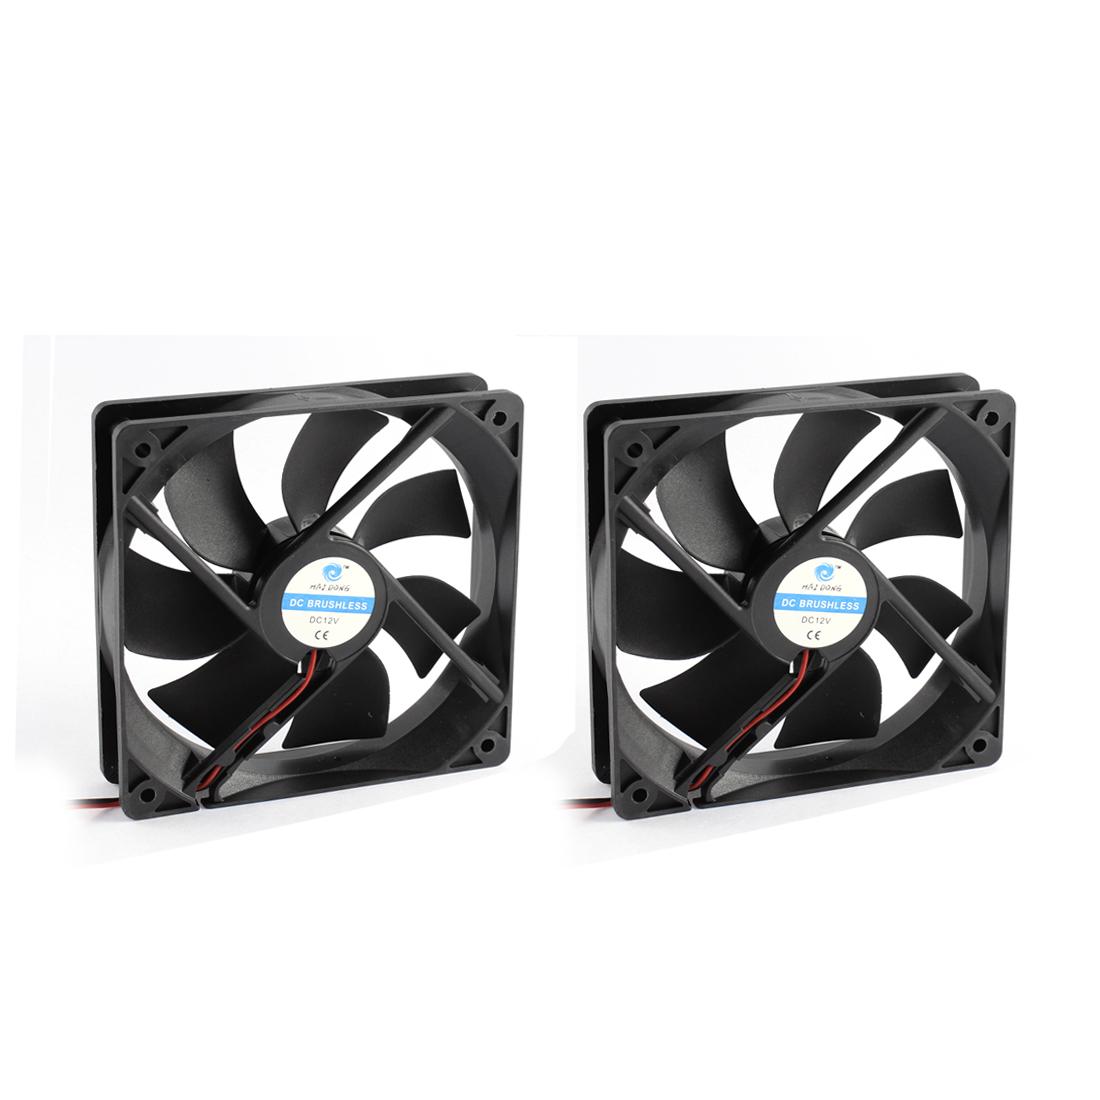 2pcs 12V 2-Wired Black Plastic 7 Fans DC Brushless Axial Cooling Fan Heatsink Cooler 12 x 12 x 2.5cm